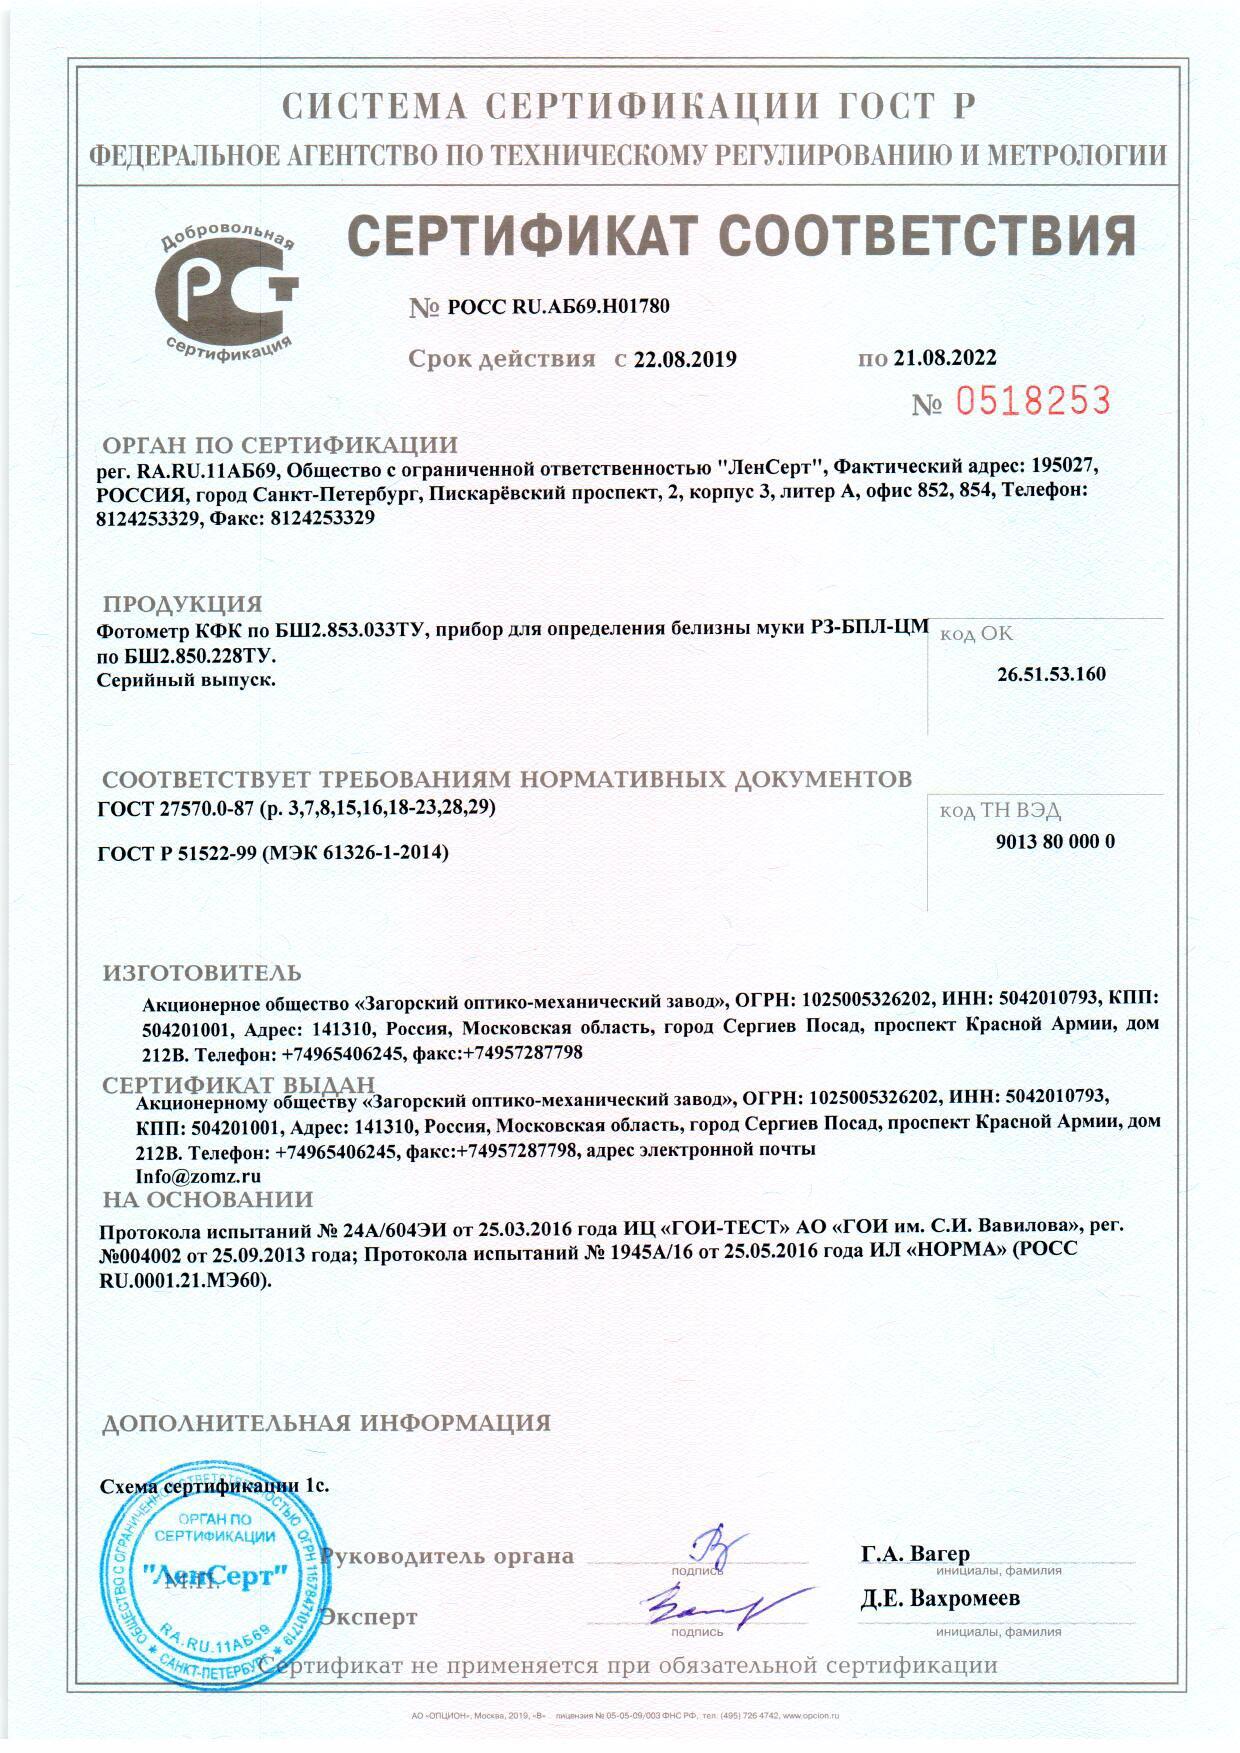 сертификат КФК фотометр ЗОМЗ